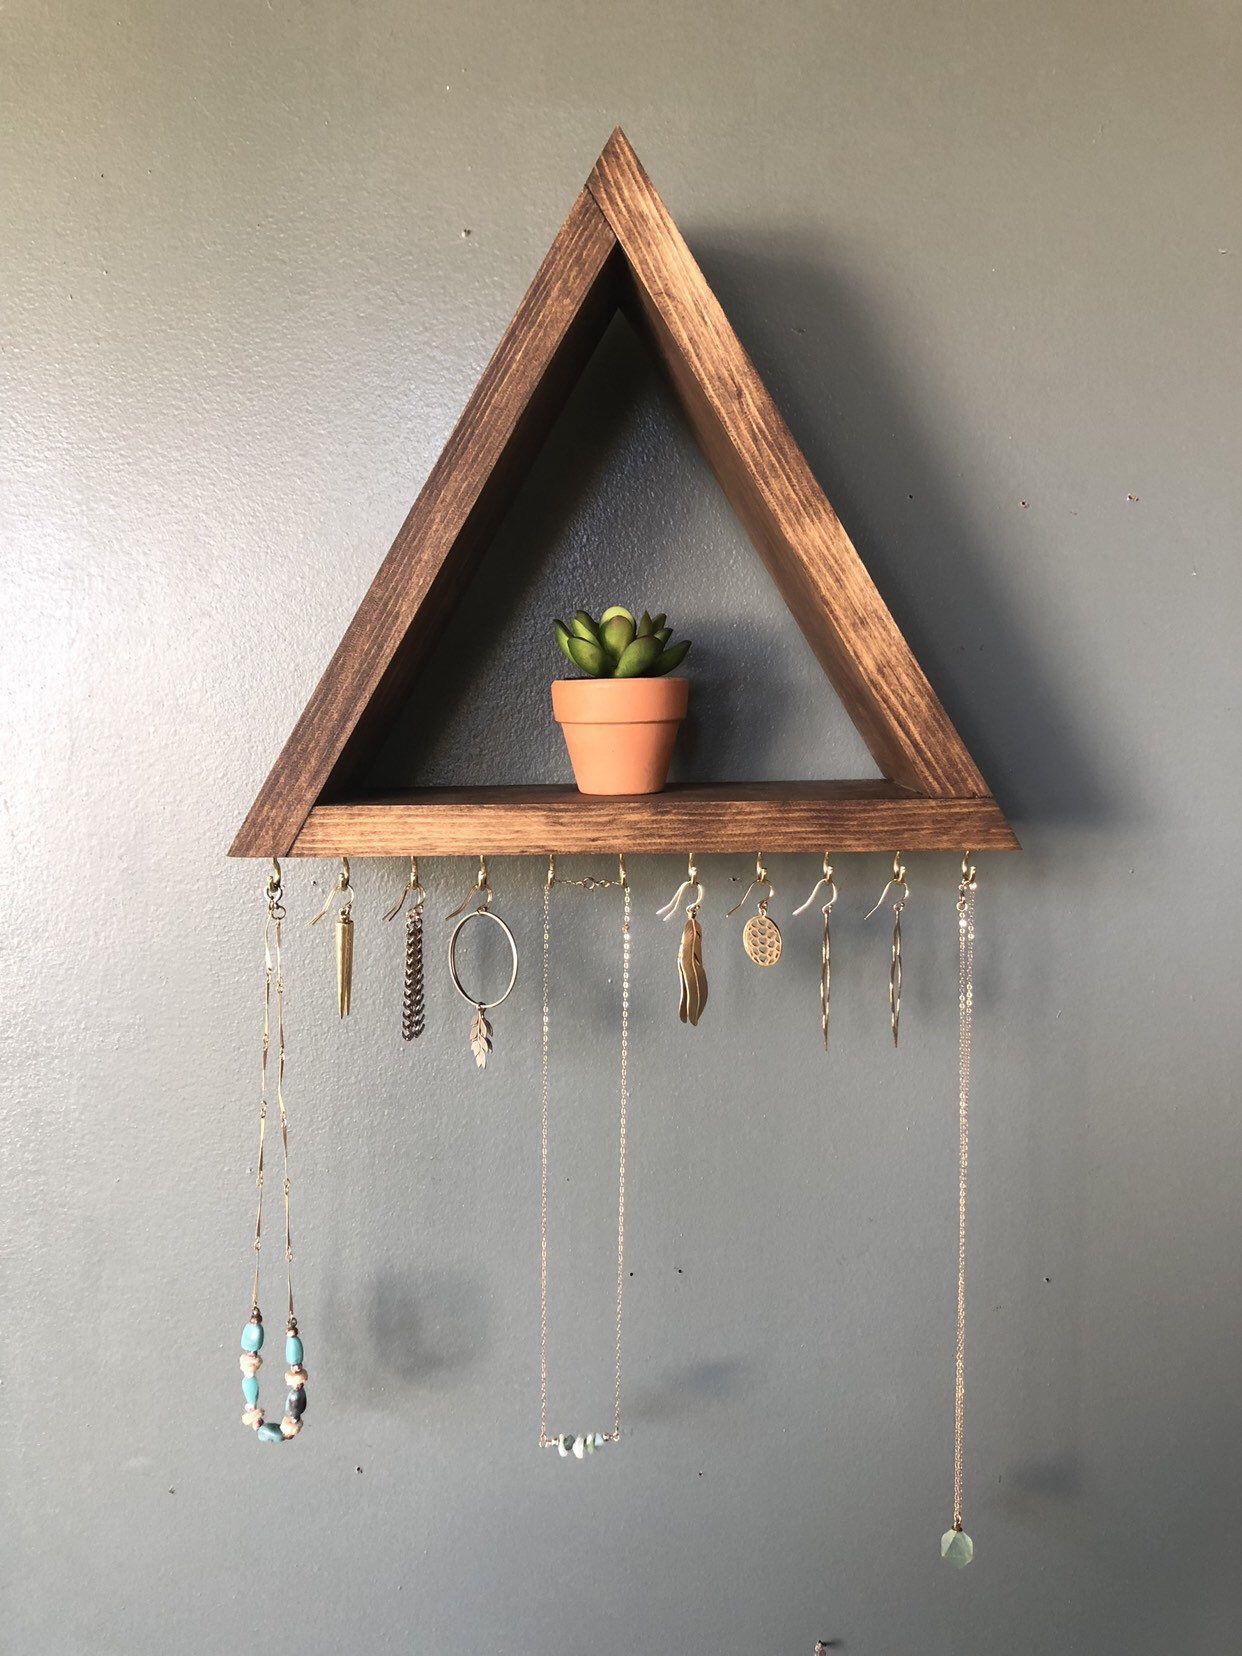 Jewelry Organizer Wall Holder Wood Shelf Earing Etsy In 2021 Diy